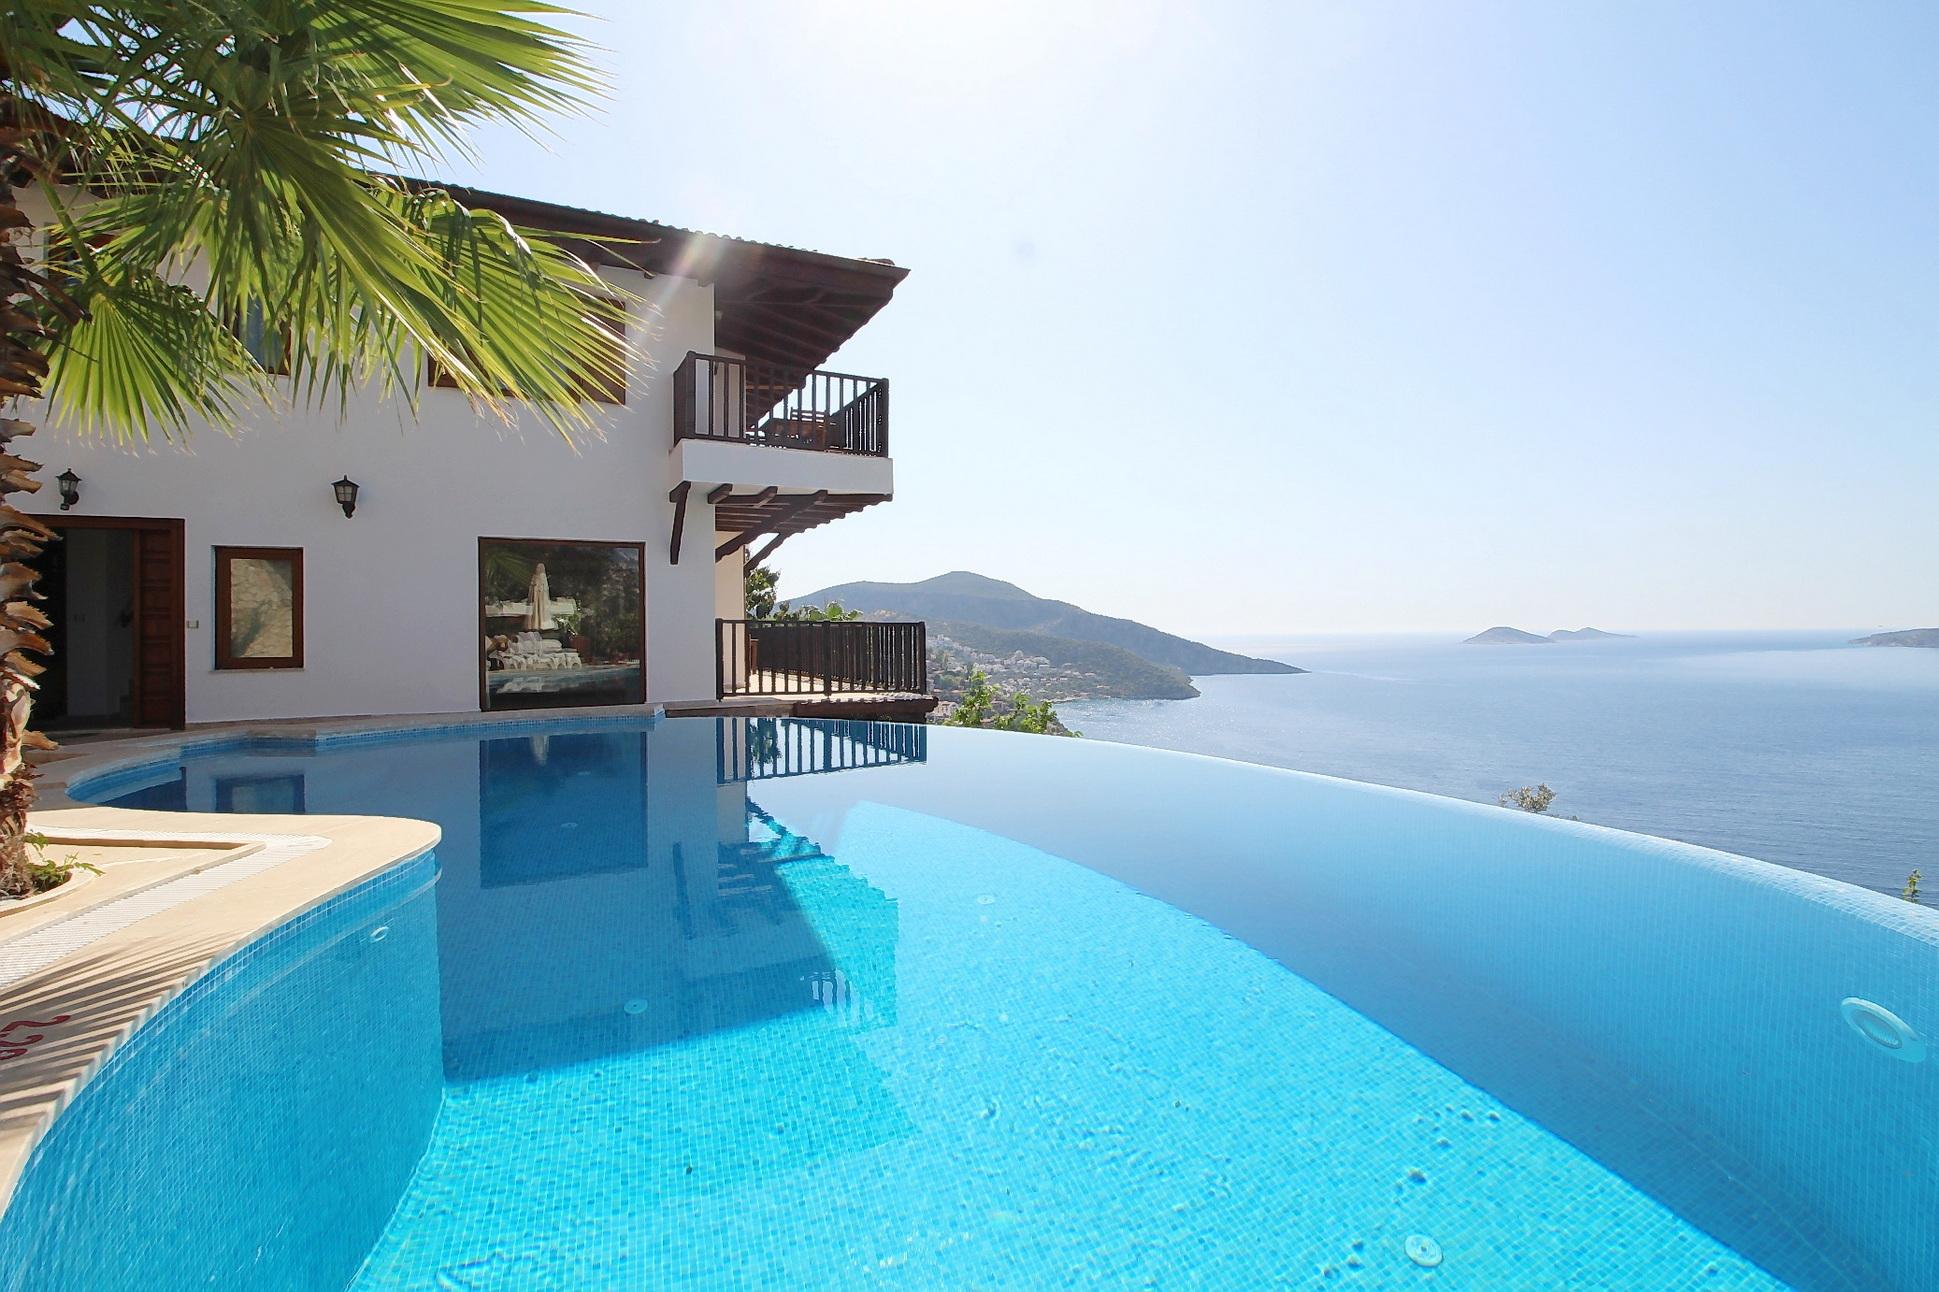 Fantastic Triplex 4-bedroom villa, set on a unique location with Infinity Pool